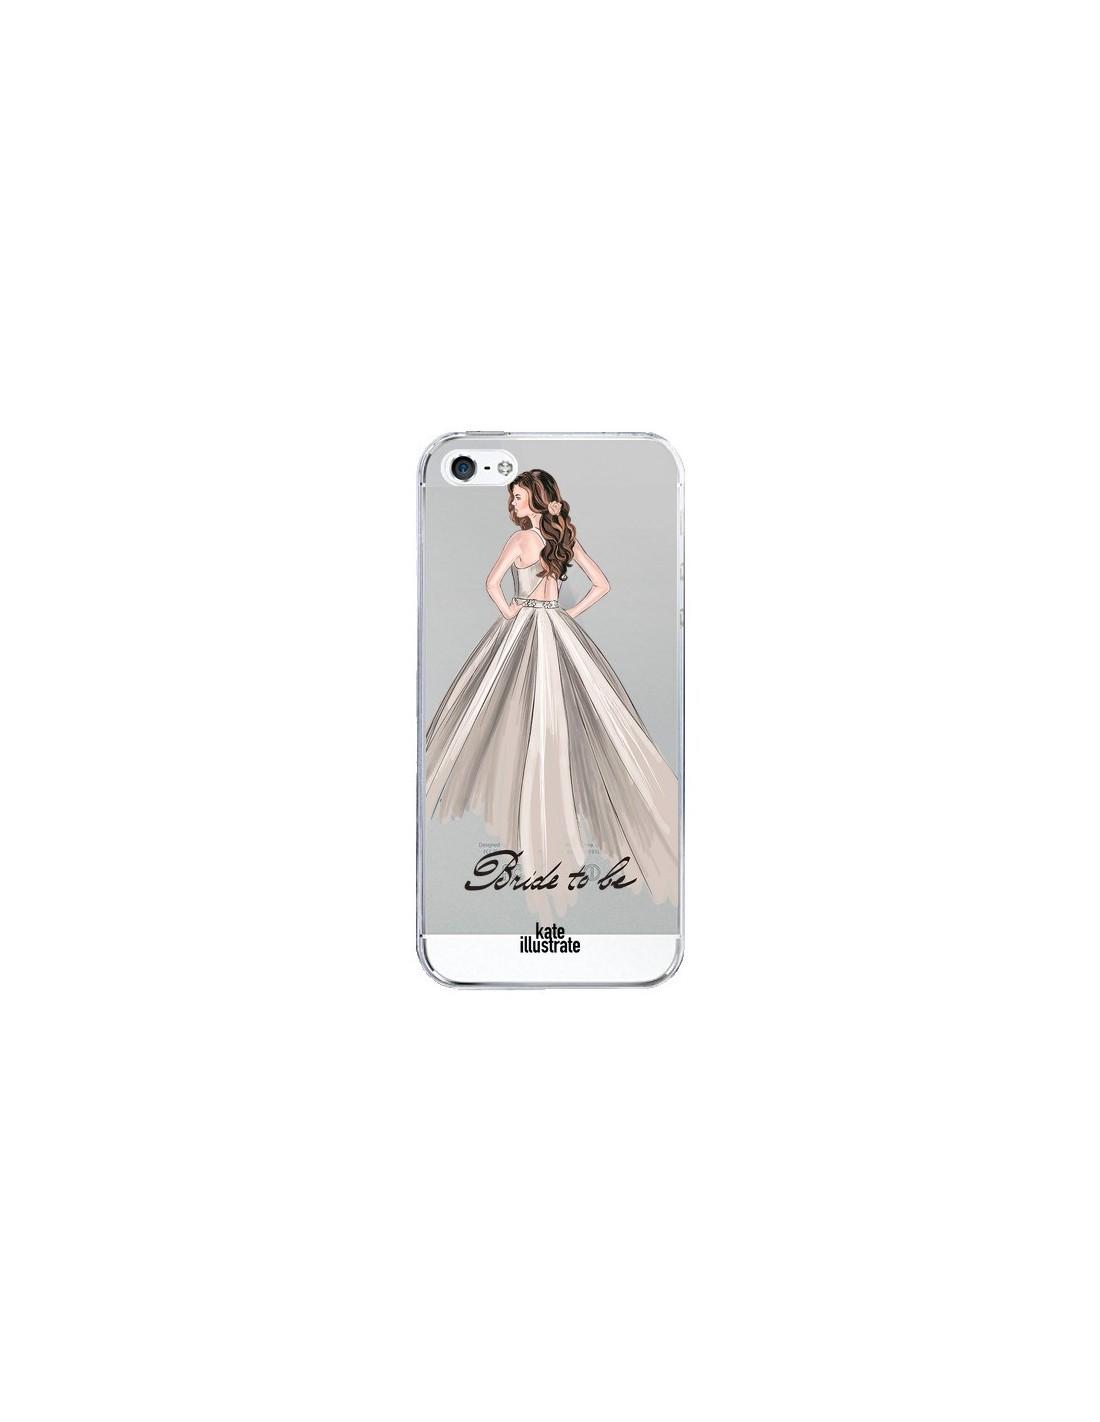 coque iphone 5 5s se bride to be mariee mariage transparente 5s et se kateillustrate